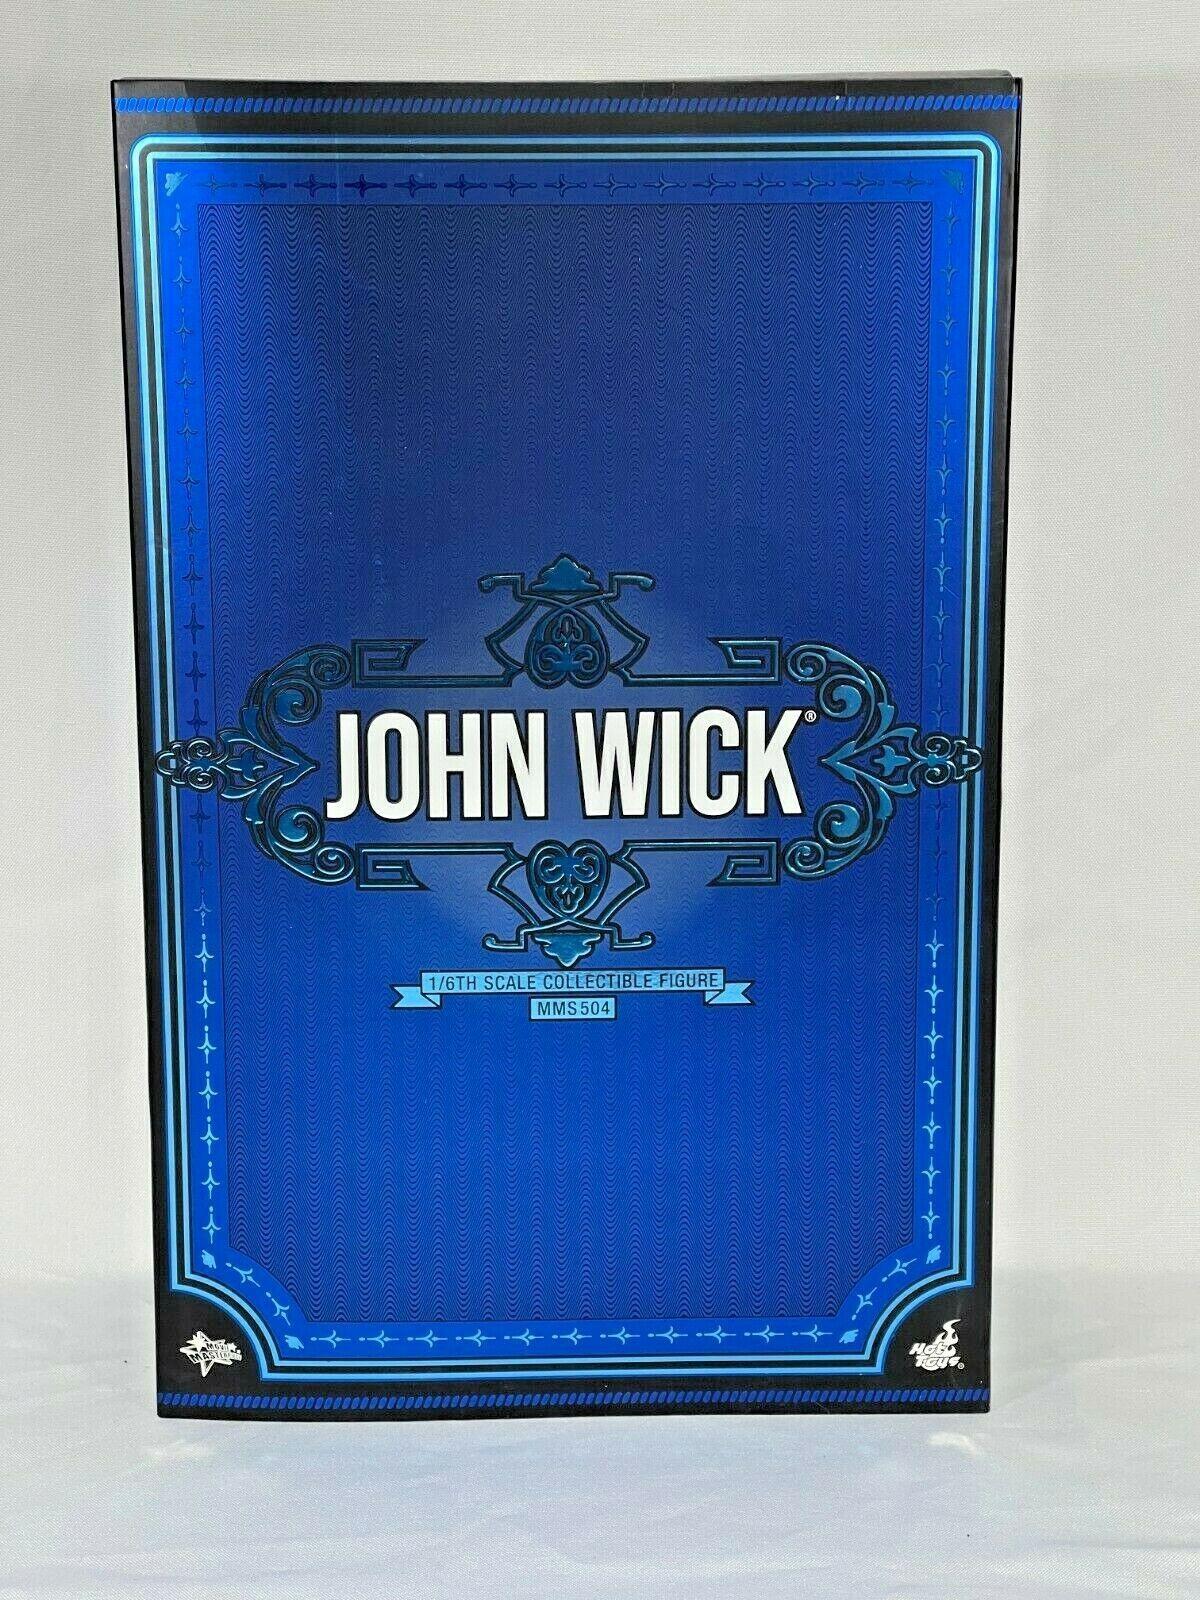 Hot Toys John Wick 2 John Wick NEW WITH ART BOX  MMS504  on eBay thumbnail